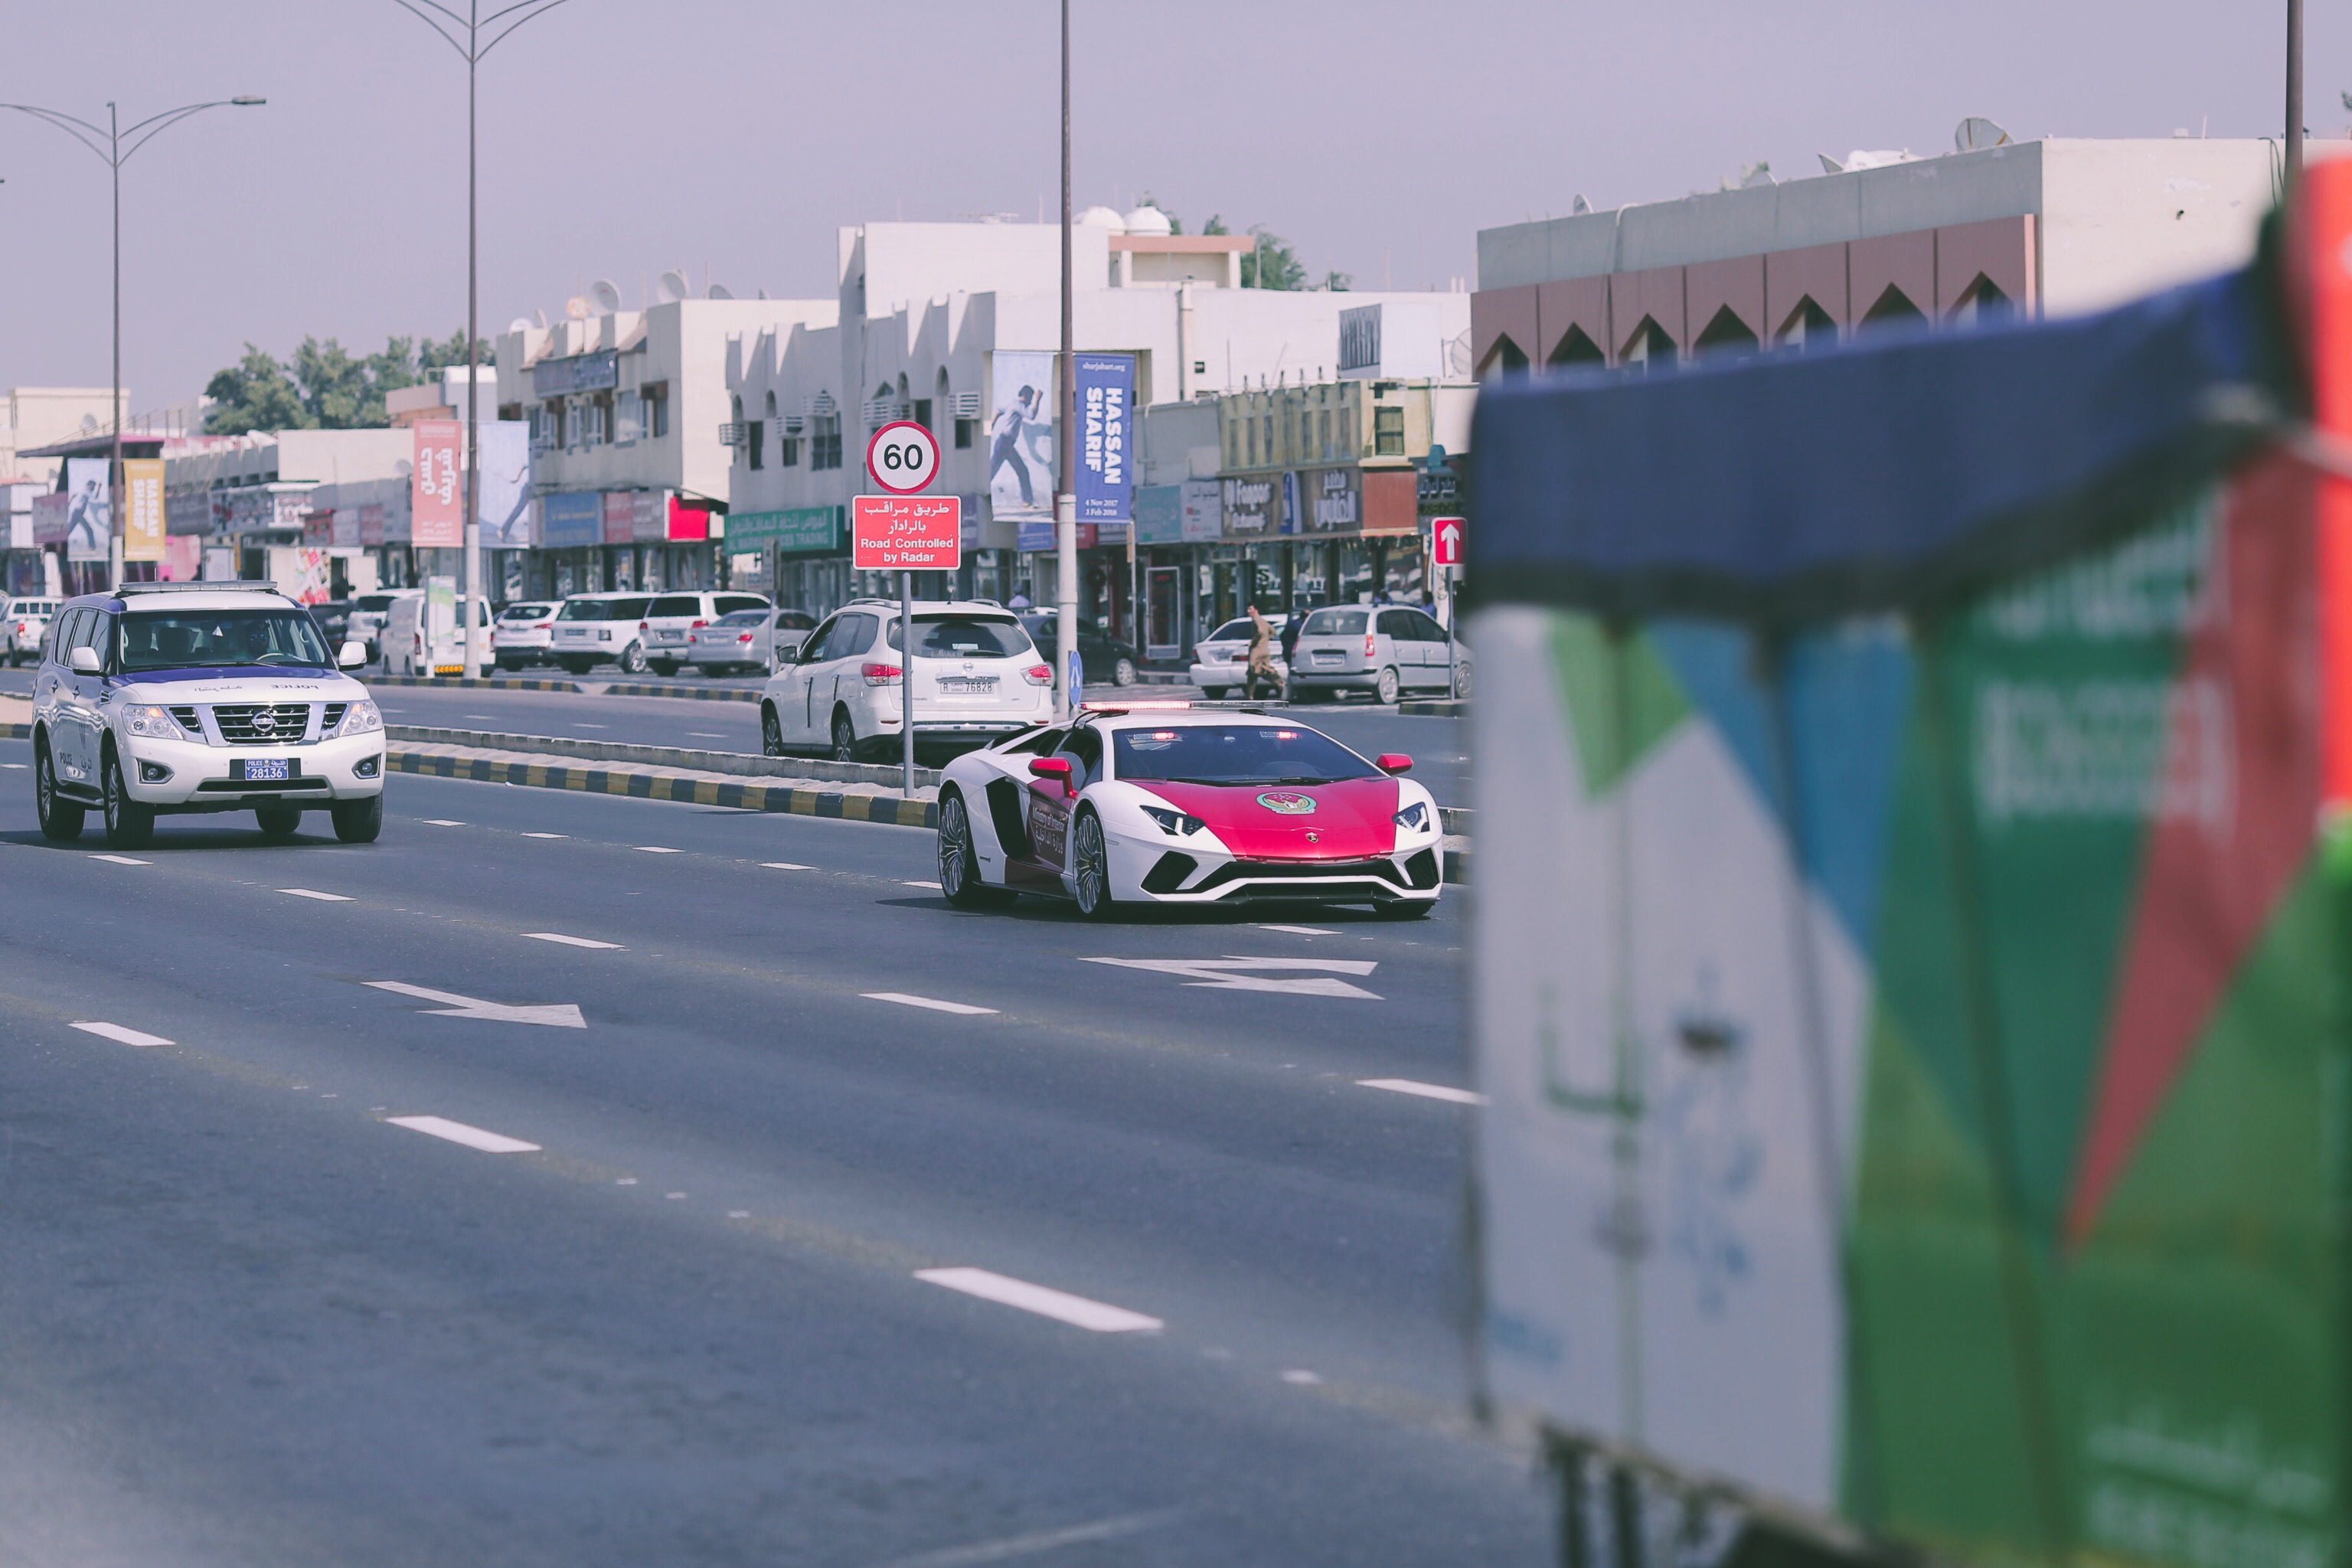 The Ministry of Interior in the UAE Gets a Lamborghini Aventador S ...